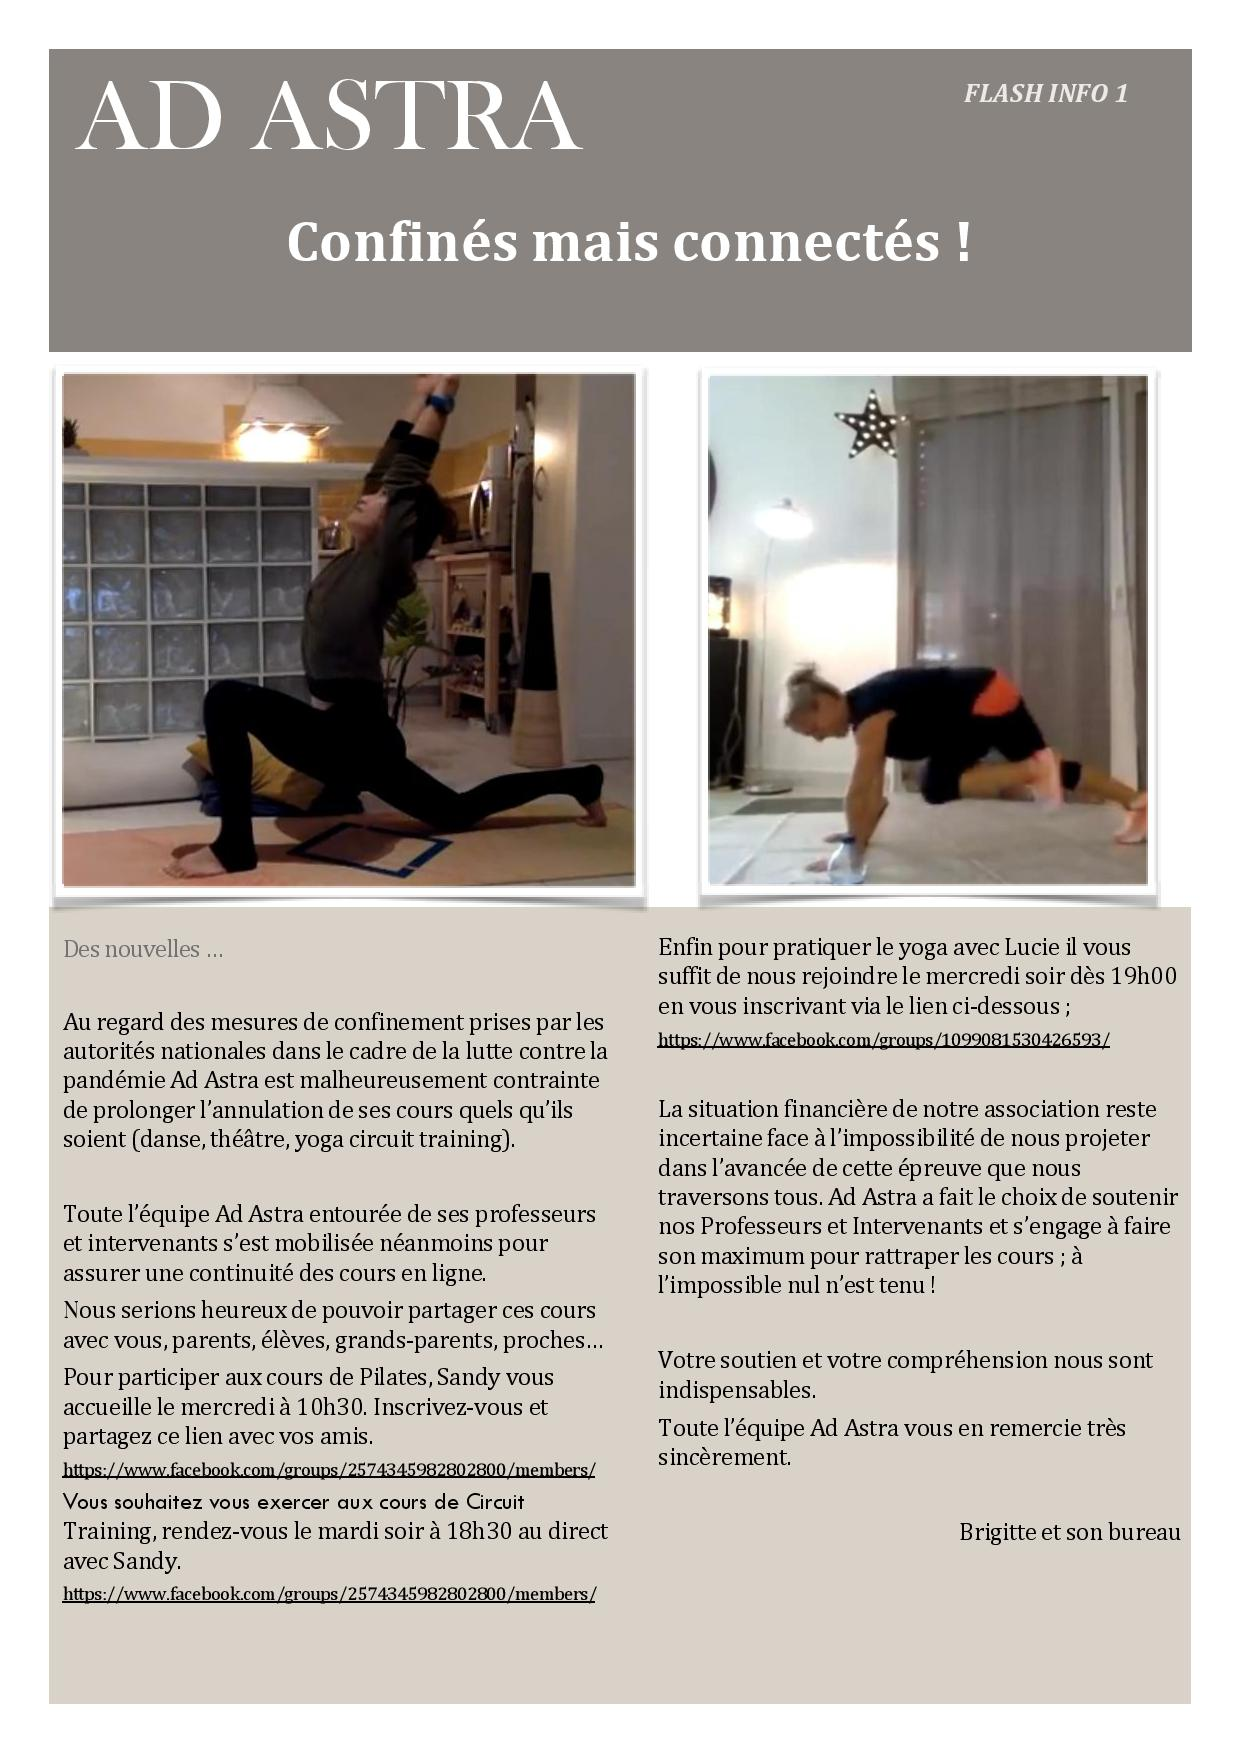 Ad Astra : Circuit training, pilates, Yoga en ligne !